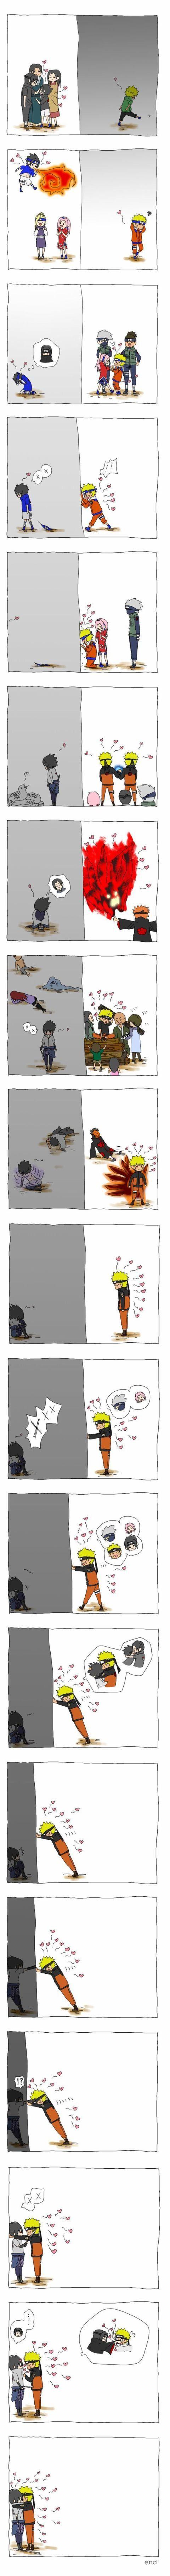 Al final Naruto era una historia yaoi encubierta